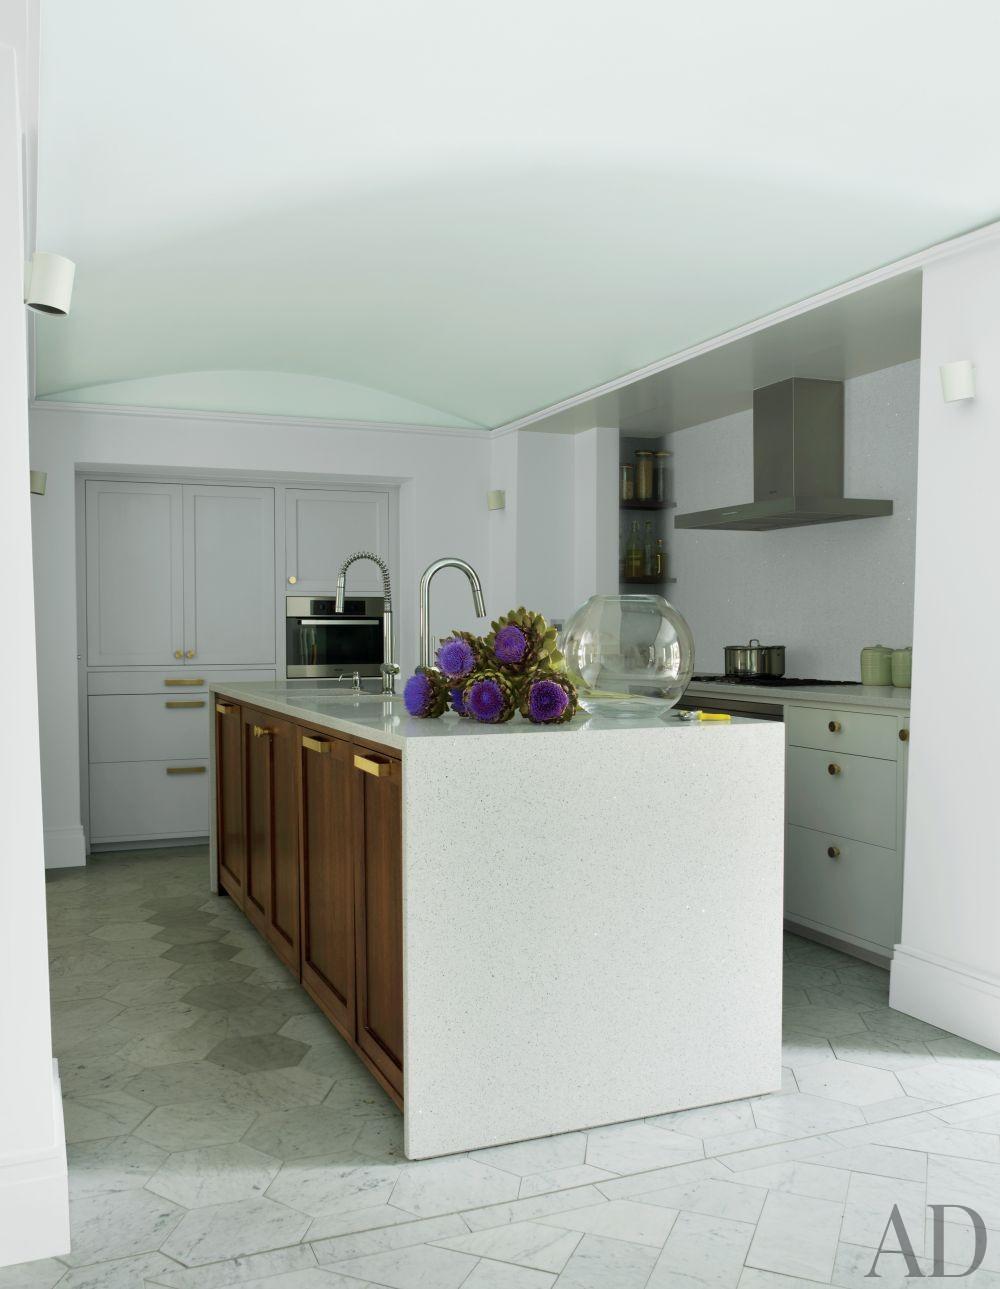 Contemporary Kitchen by Rafael de Cárdenas Ltd./Architecture at Large in London, England